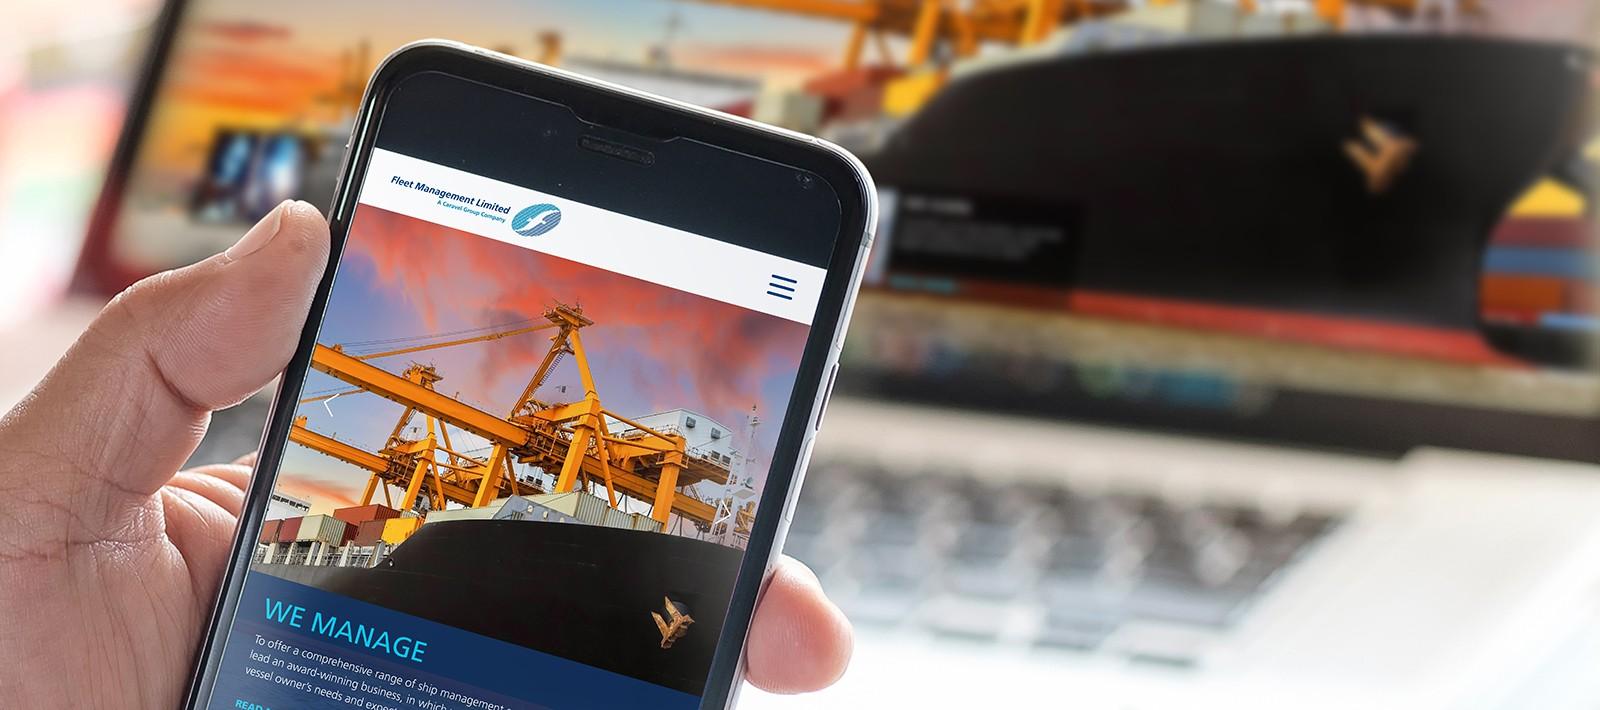 Online marketing for Fleet Management